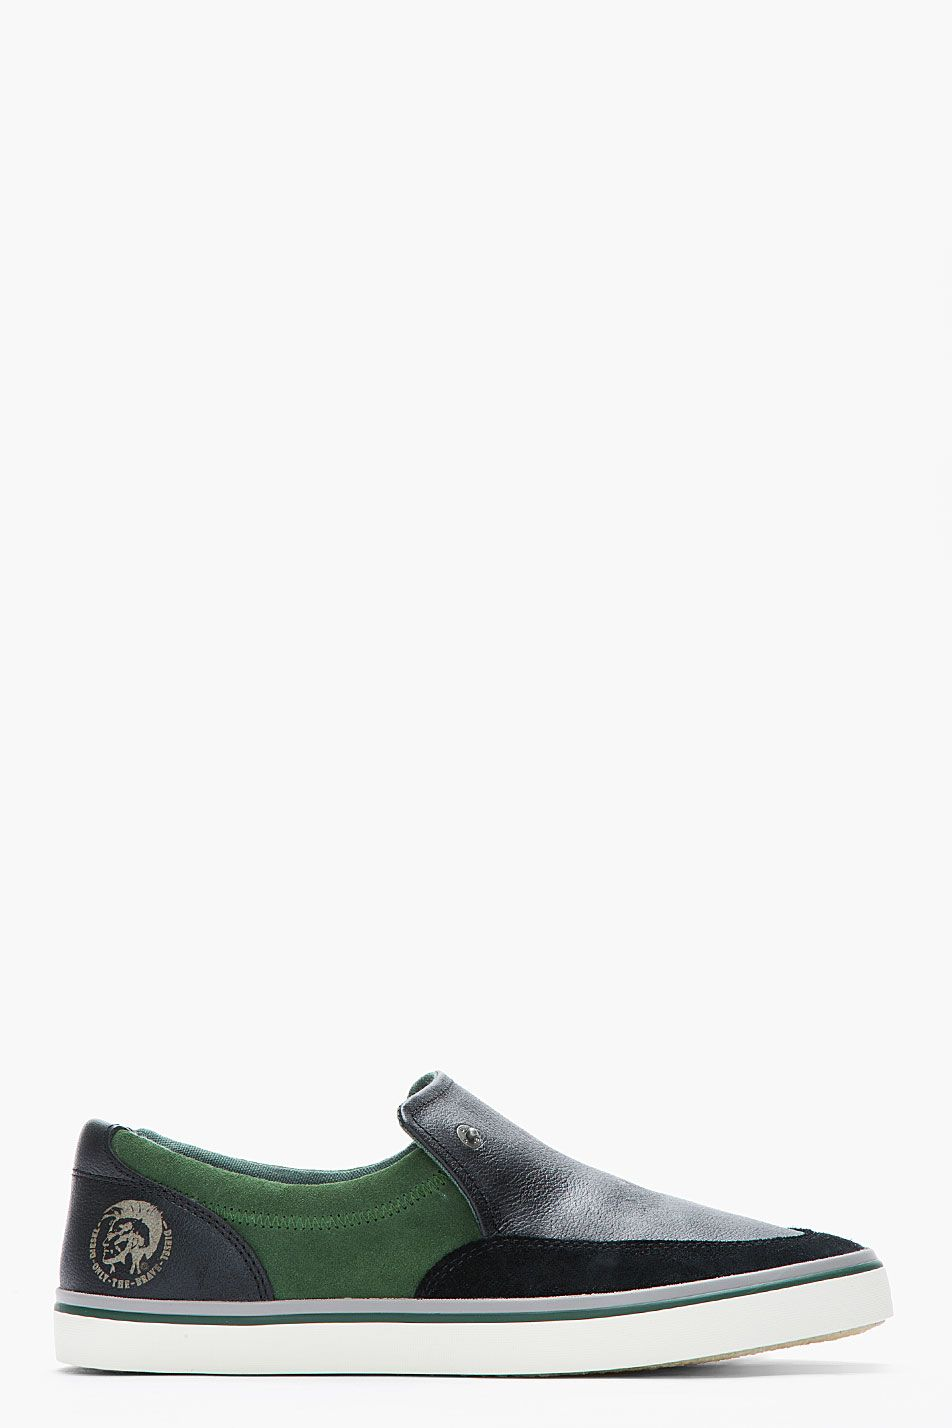 679551e3d05 DIESEL Black & Forest Green Leather Labuan Slip Ons | Men's Shoes ...